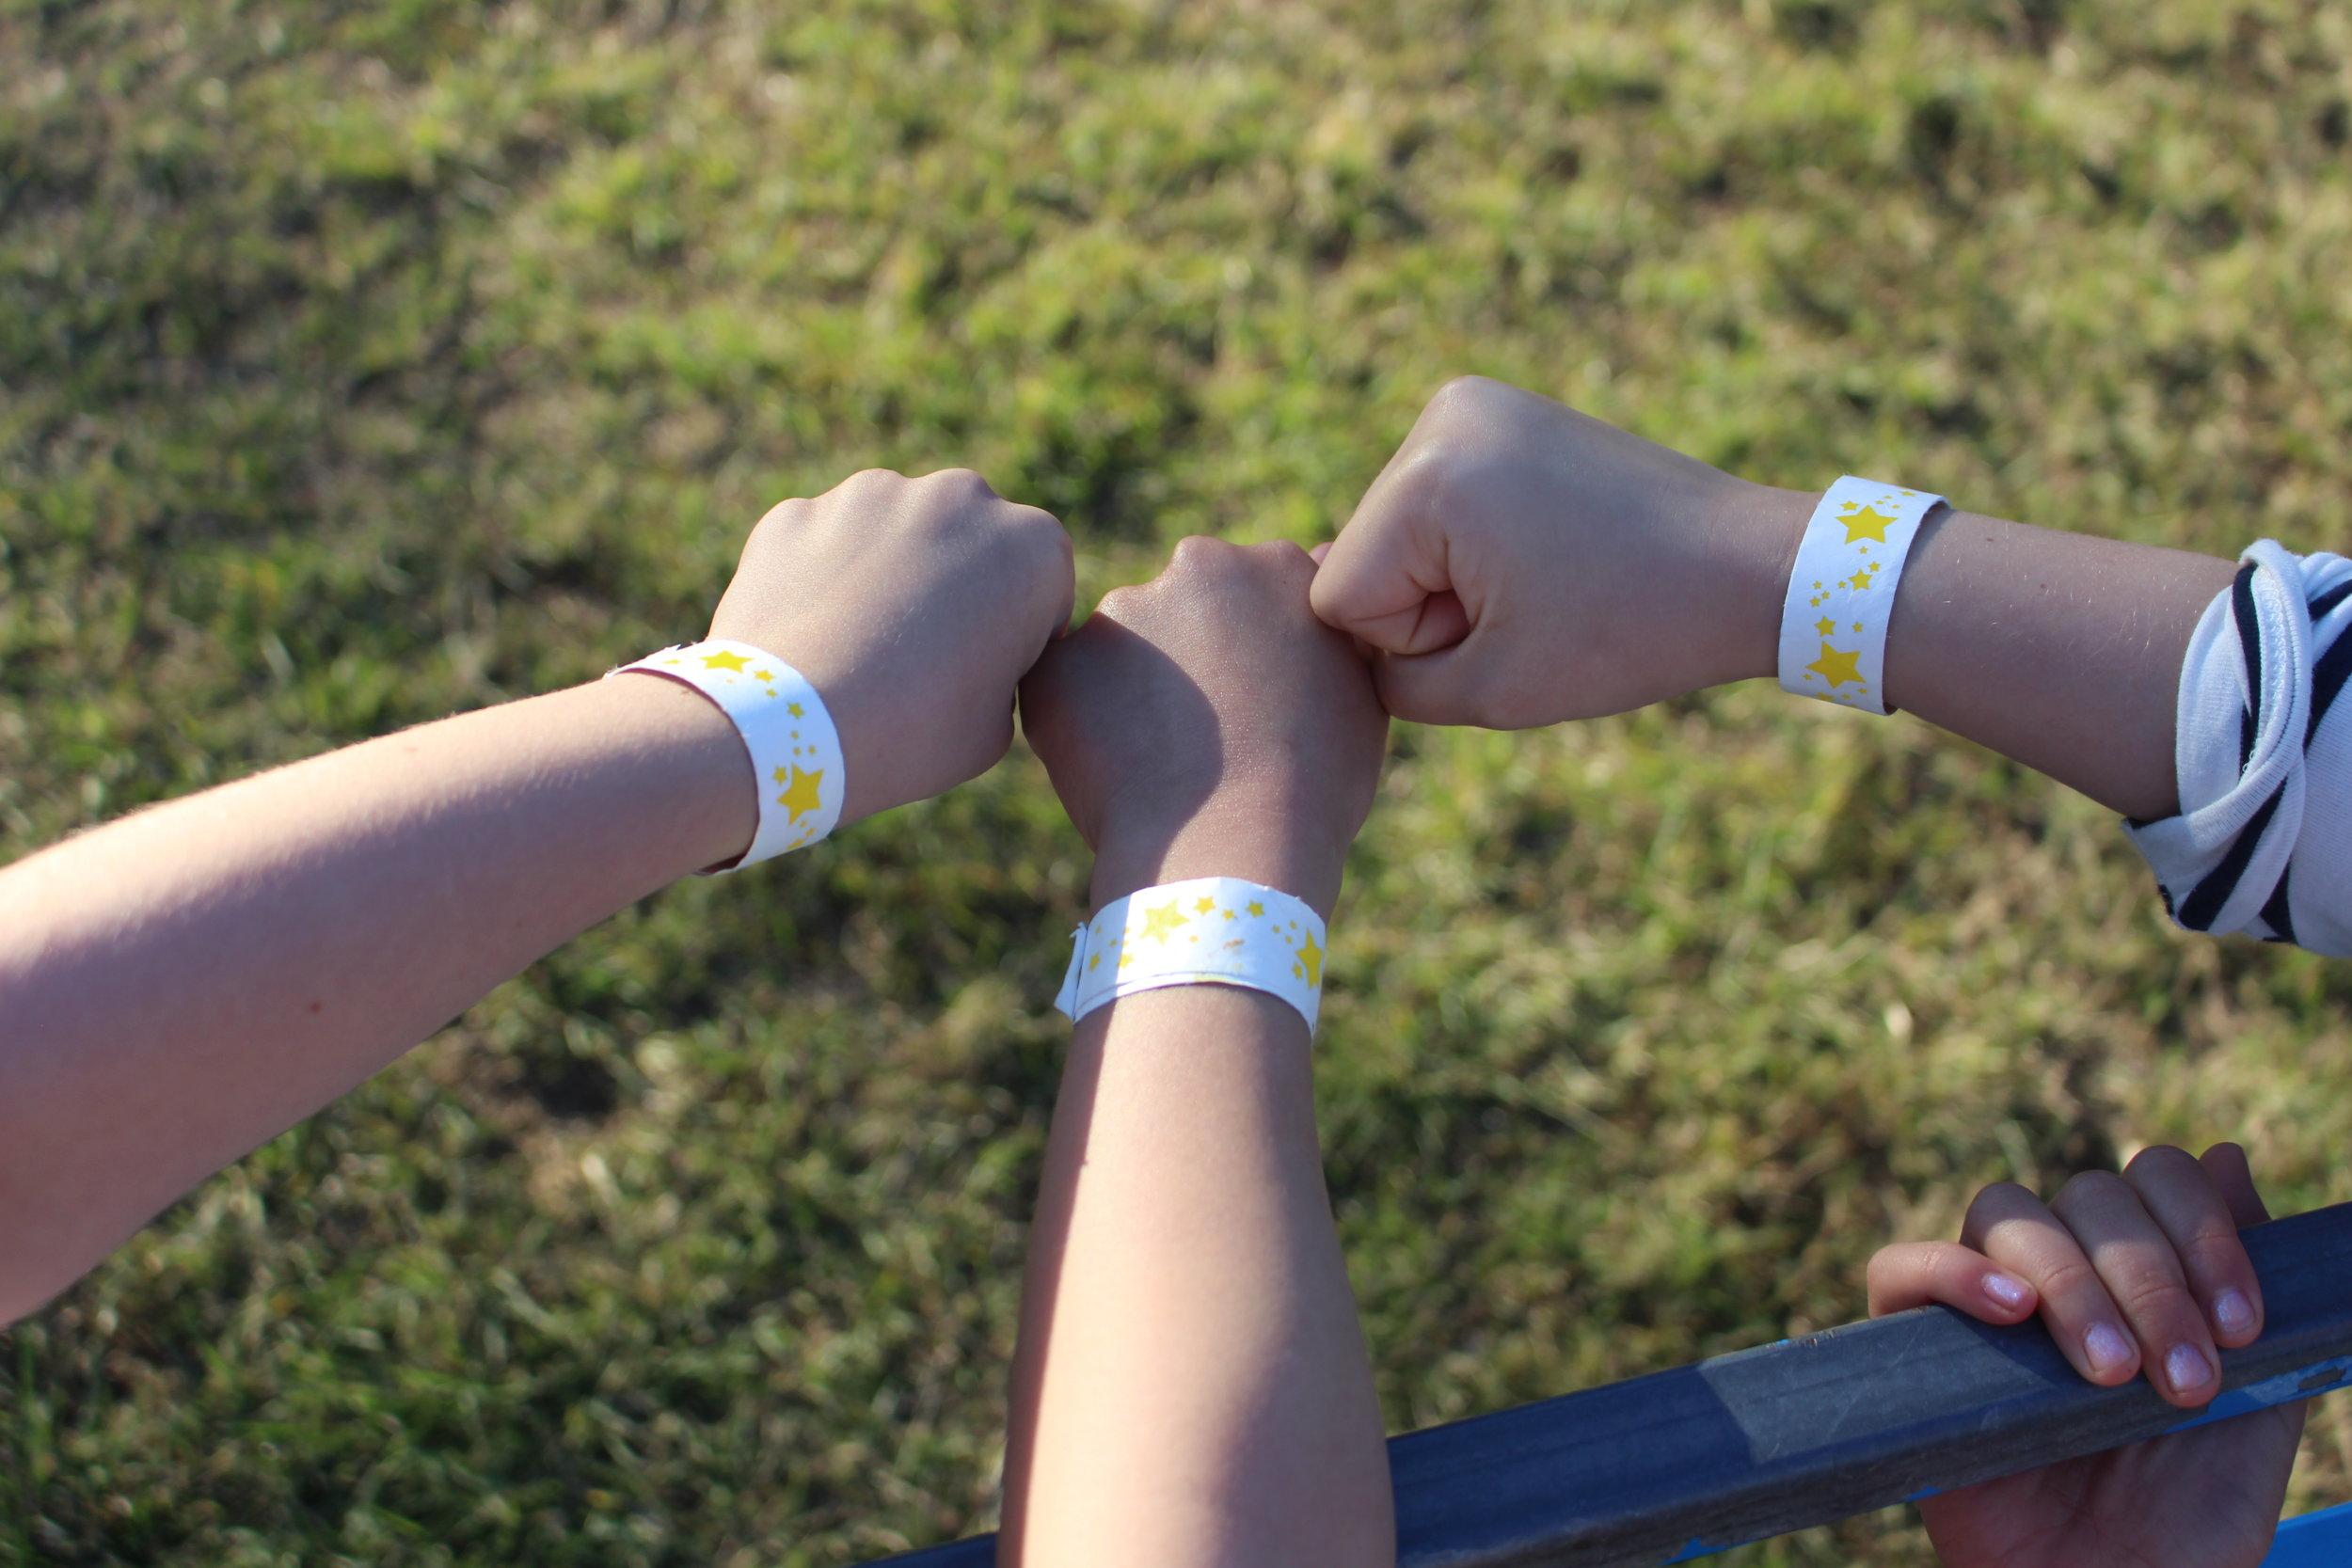 ride wrist bands.JPG